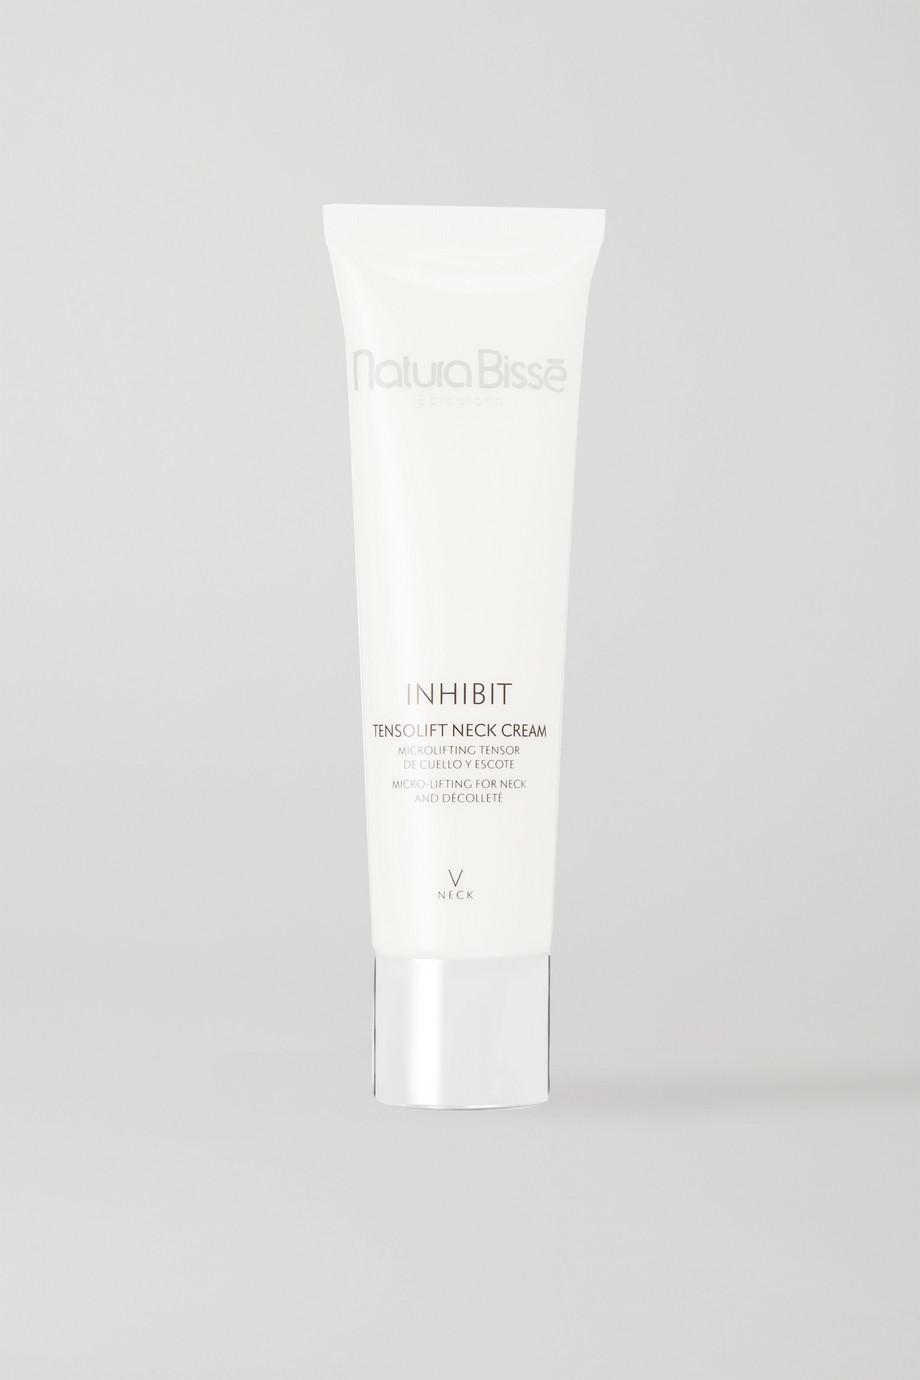 Natura Bissé Inhibit Tensolift Neck Cream, 100ml